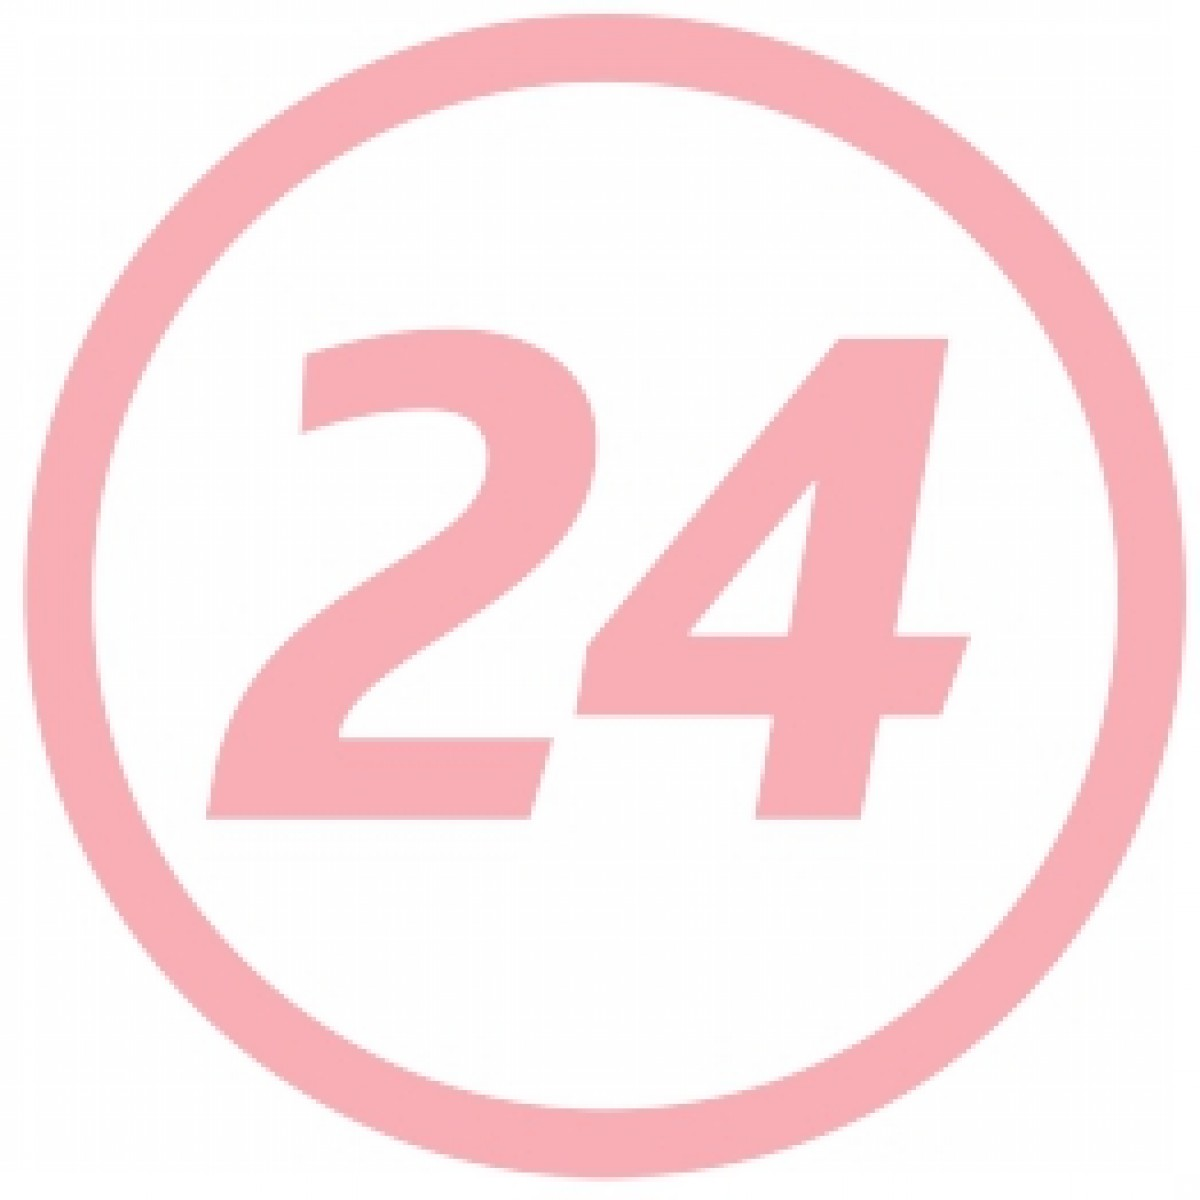 Tommee Tippee Pachet 2 Biberoane Anticolici cu Termometru 260ml, Pachet, 1buc